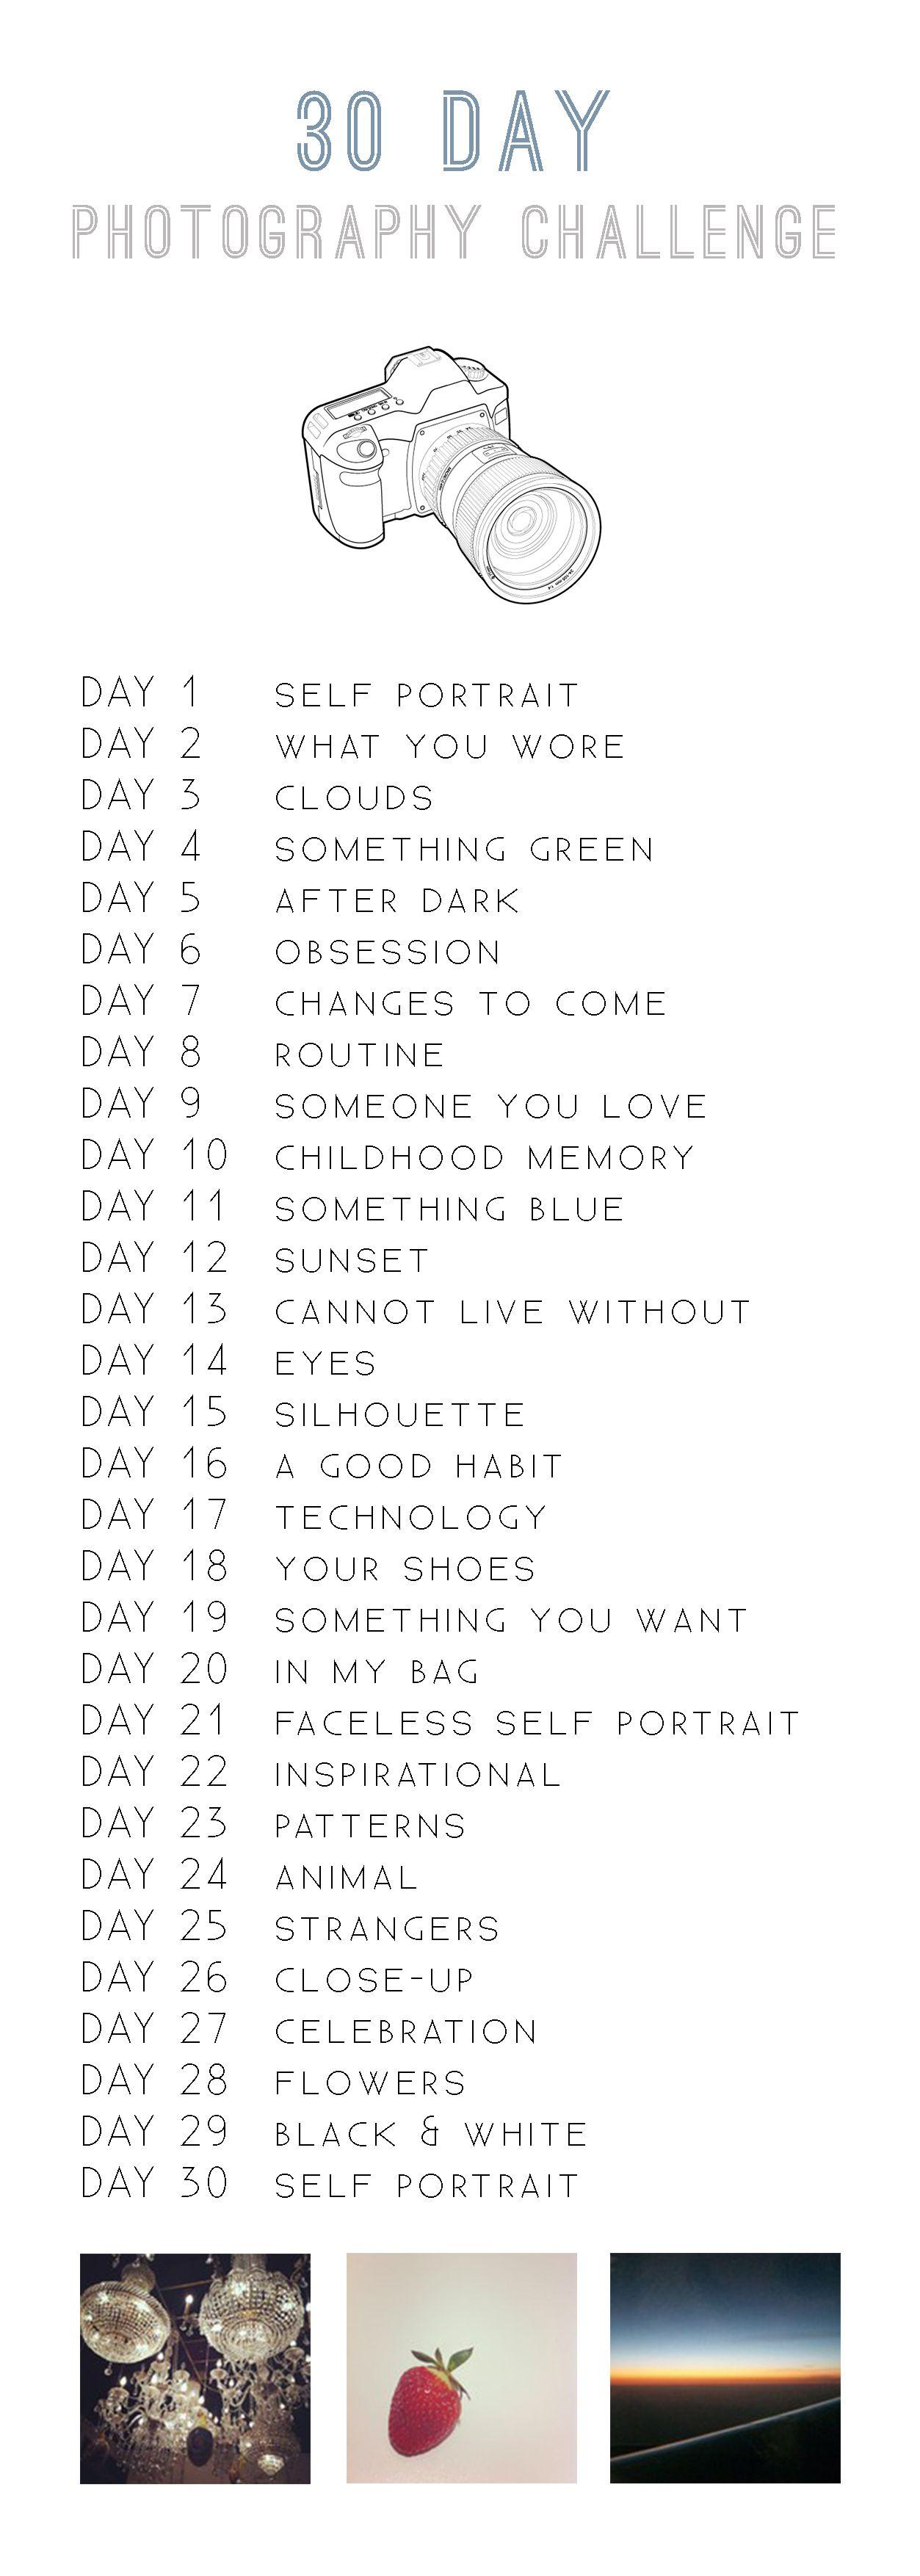 30 day photography challenge. @Kurt Miller Miller Miller Loeswick